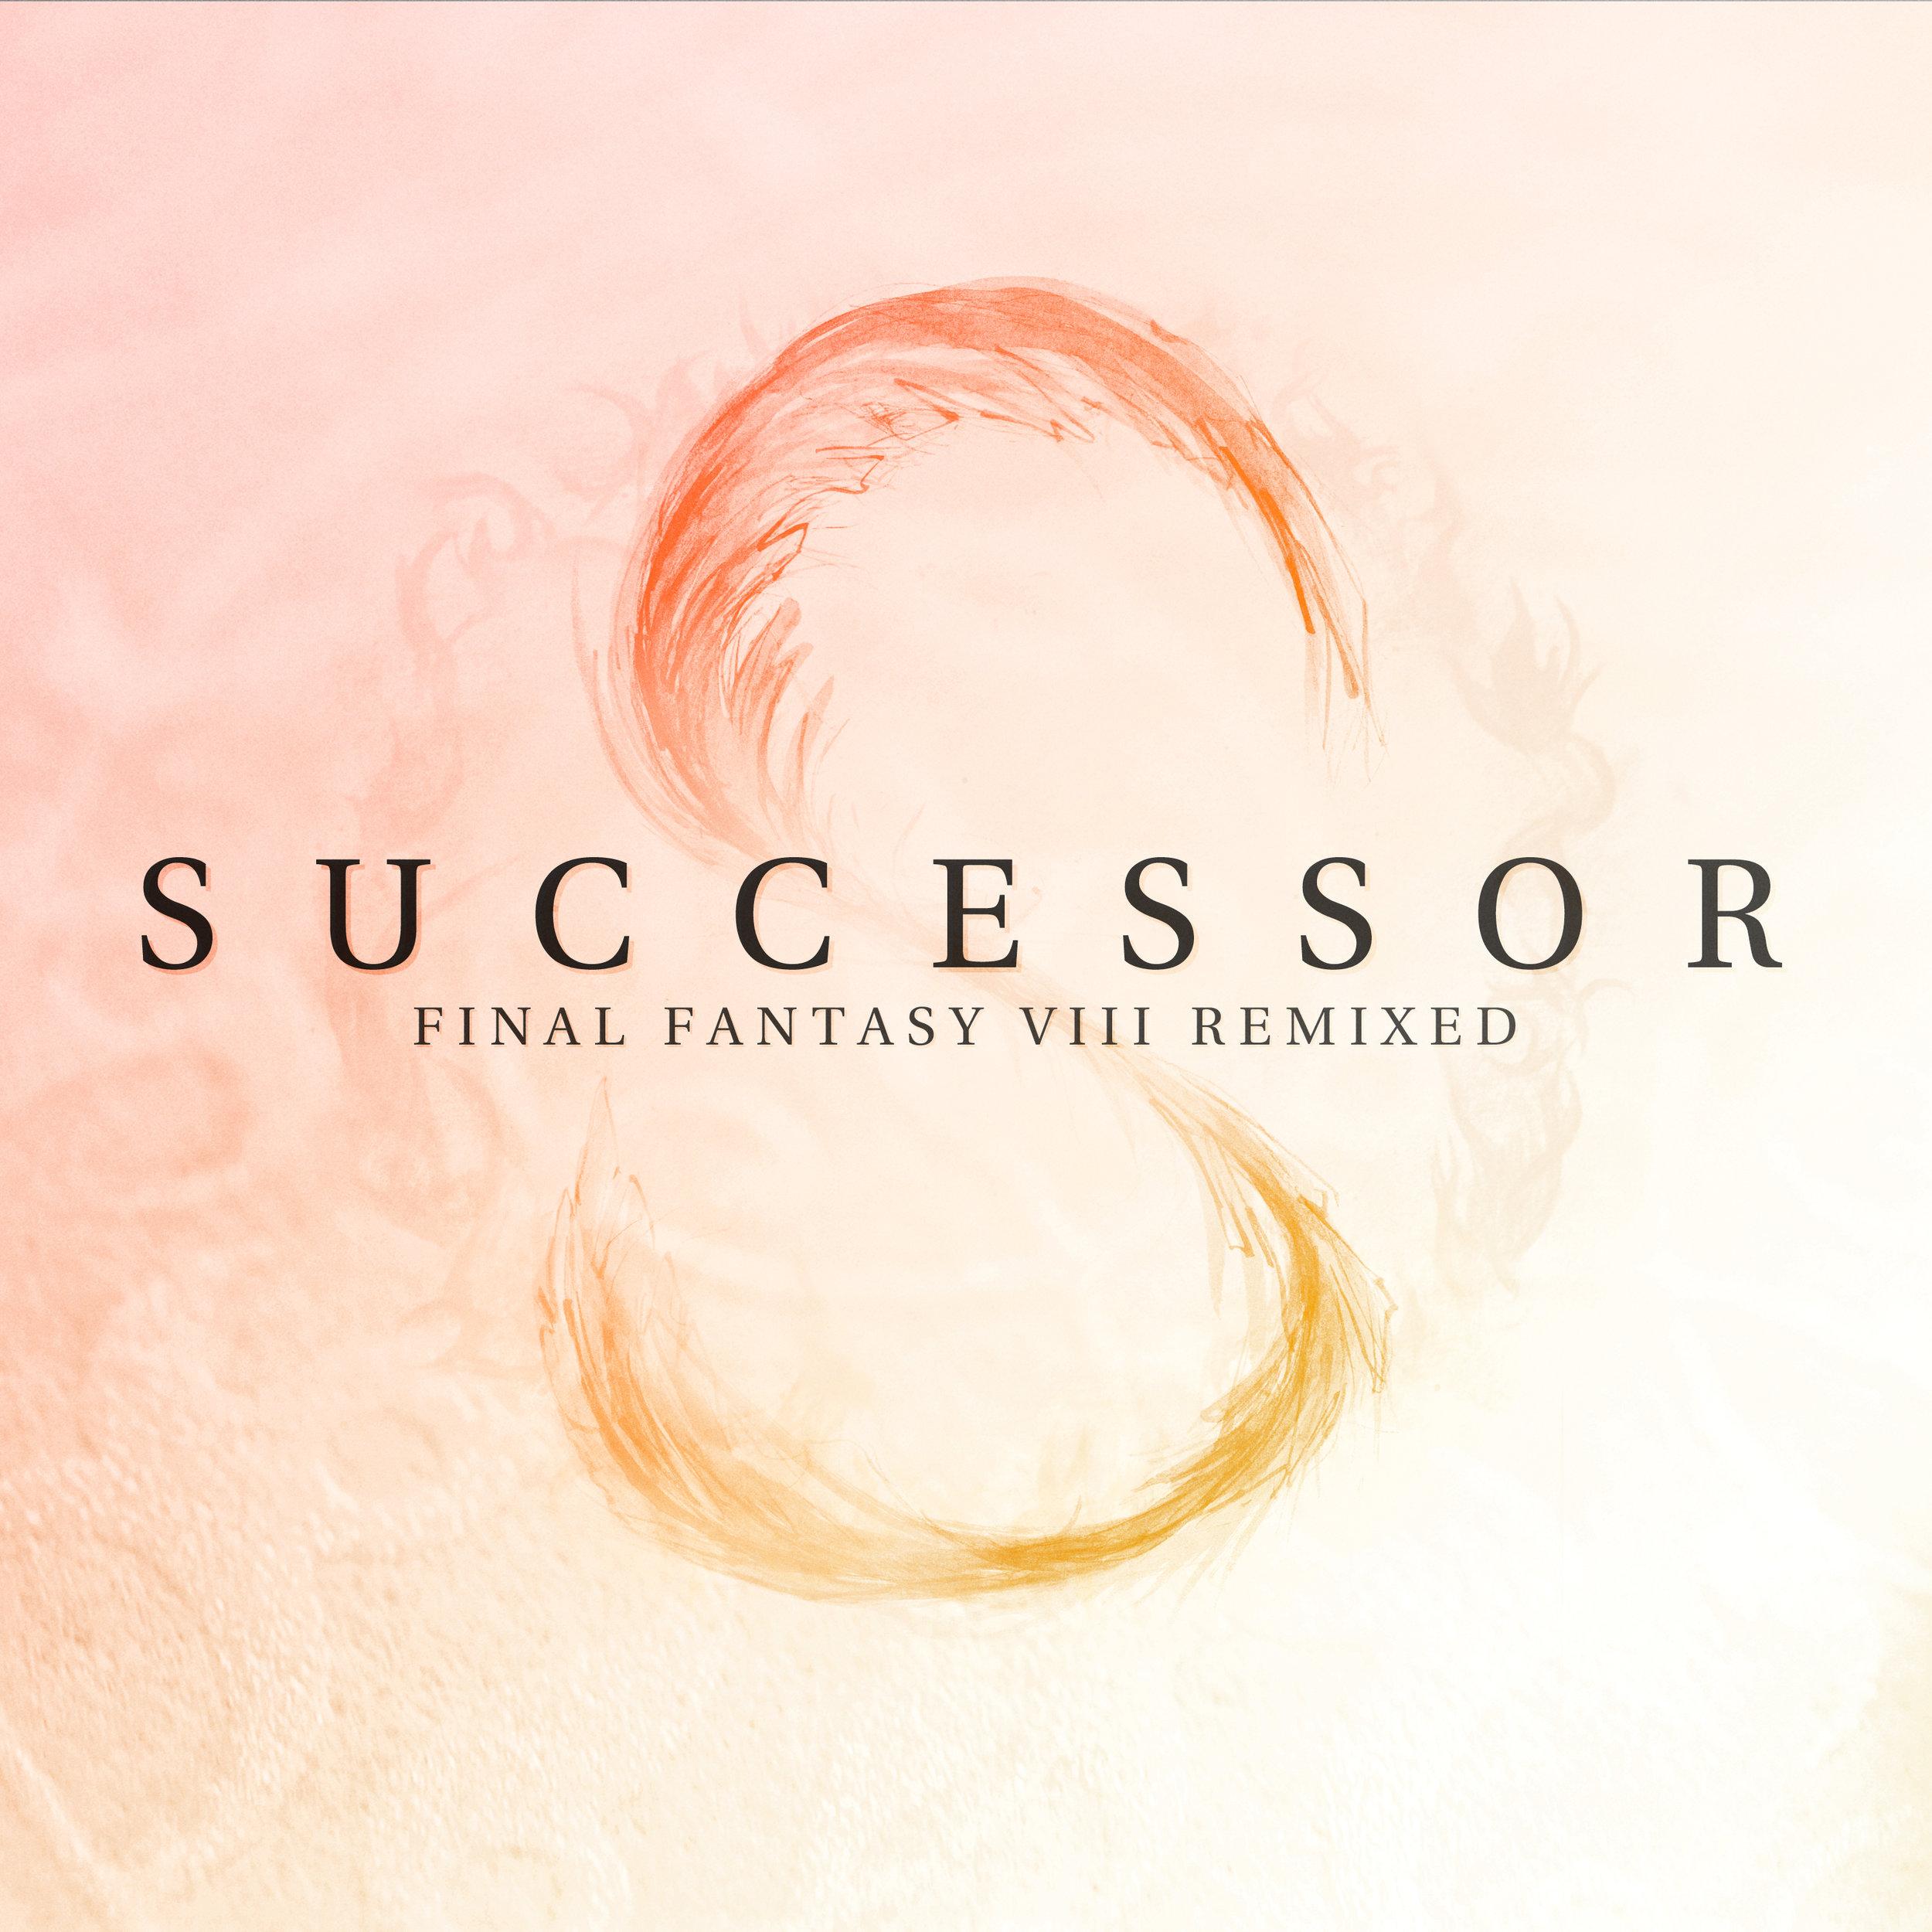 SUCCESSOR: Final Fantasy VIII Remixed    Disc 4   3. Premonition    (arr.    David Peacock   )